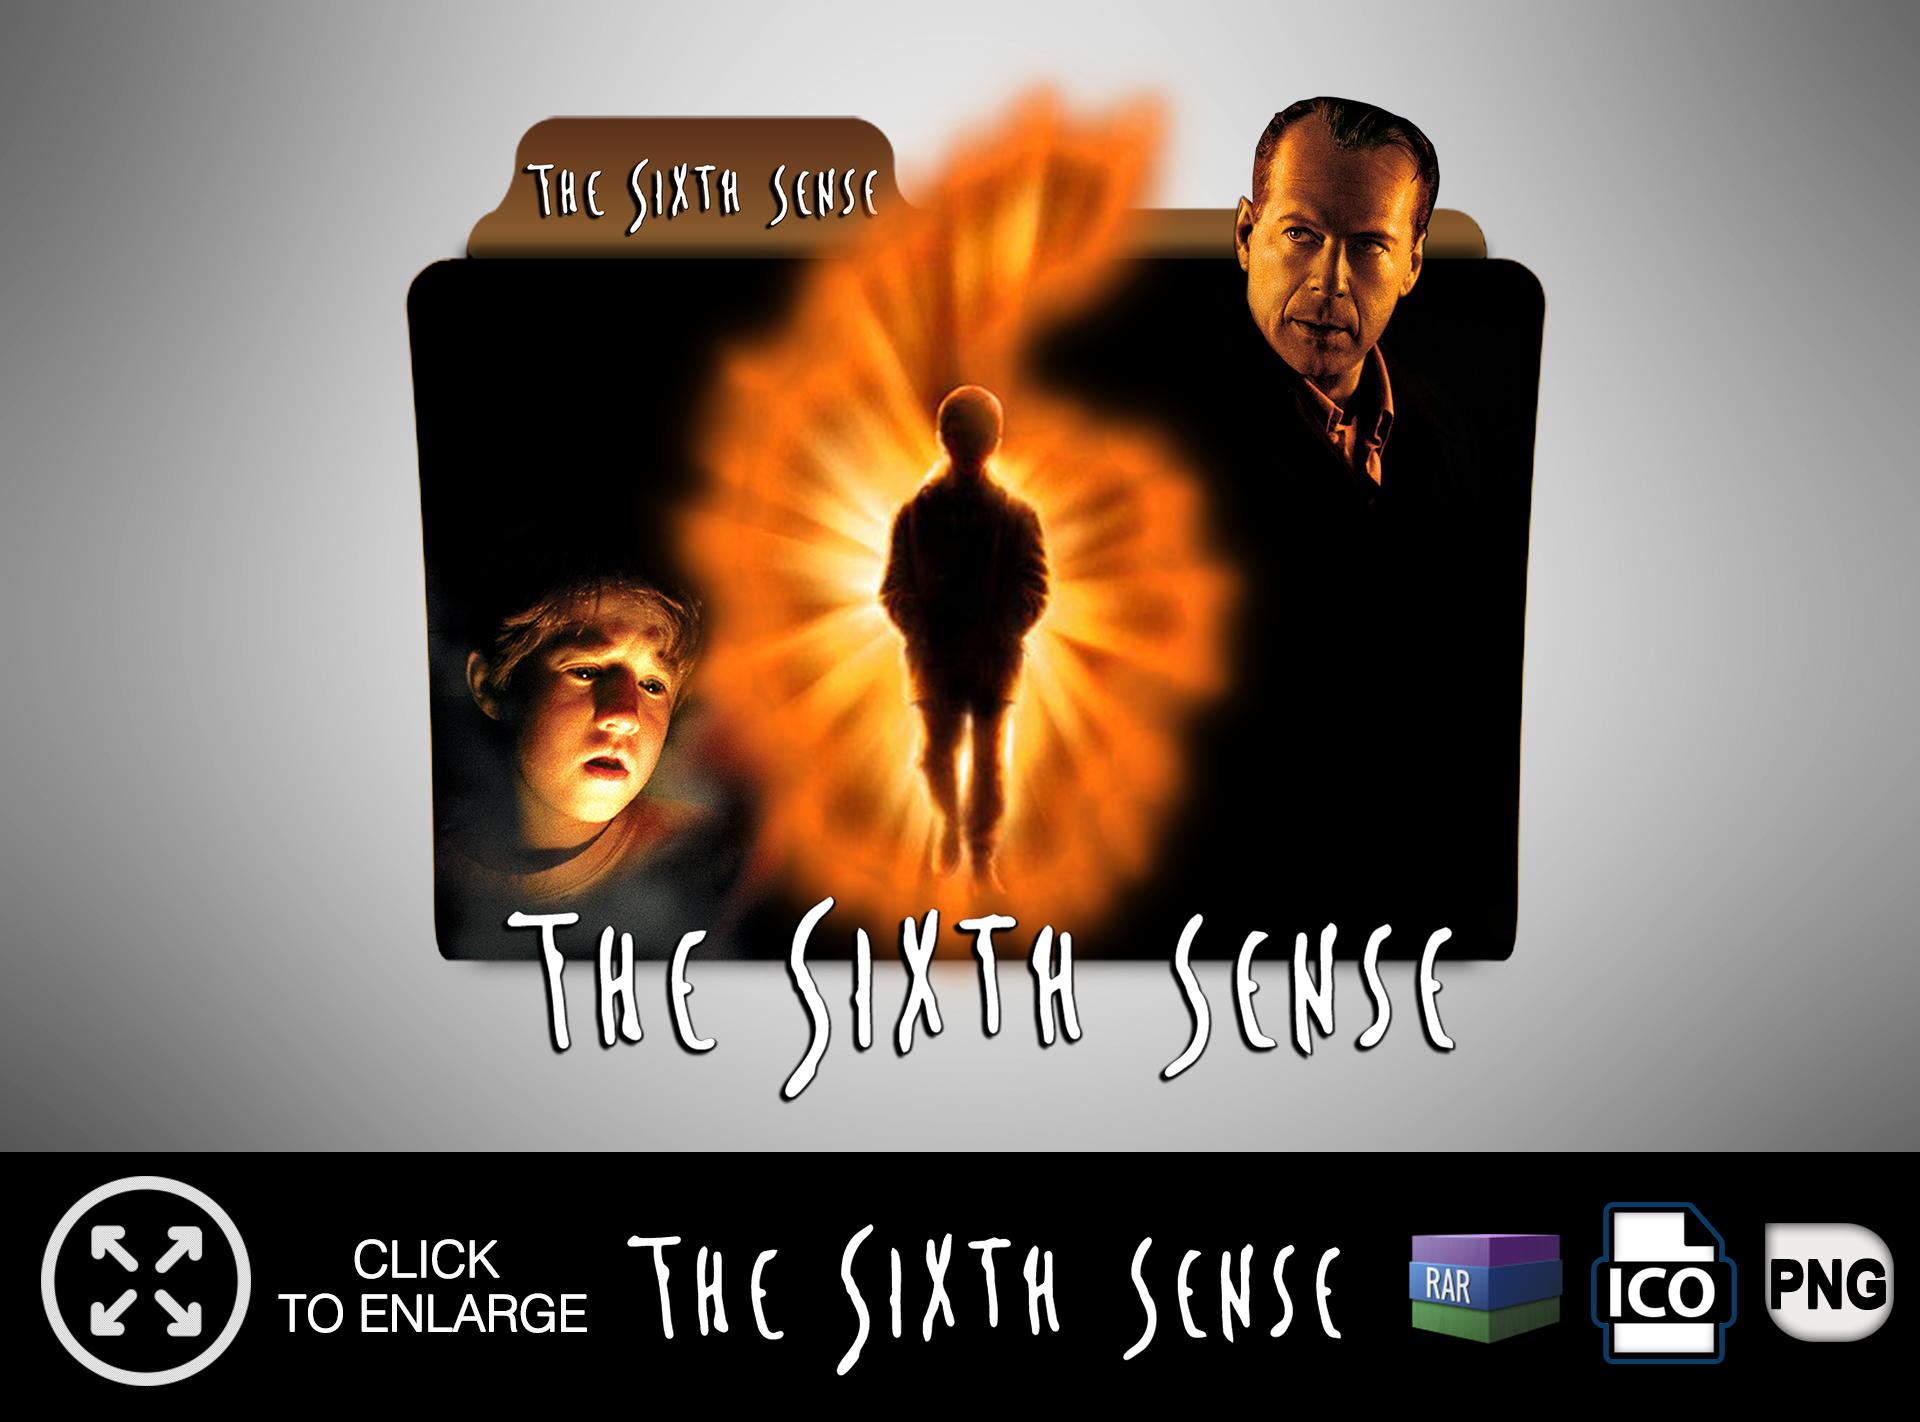 The Sixth Sense 1999 By Uki1995 On Deviantart